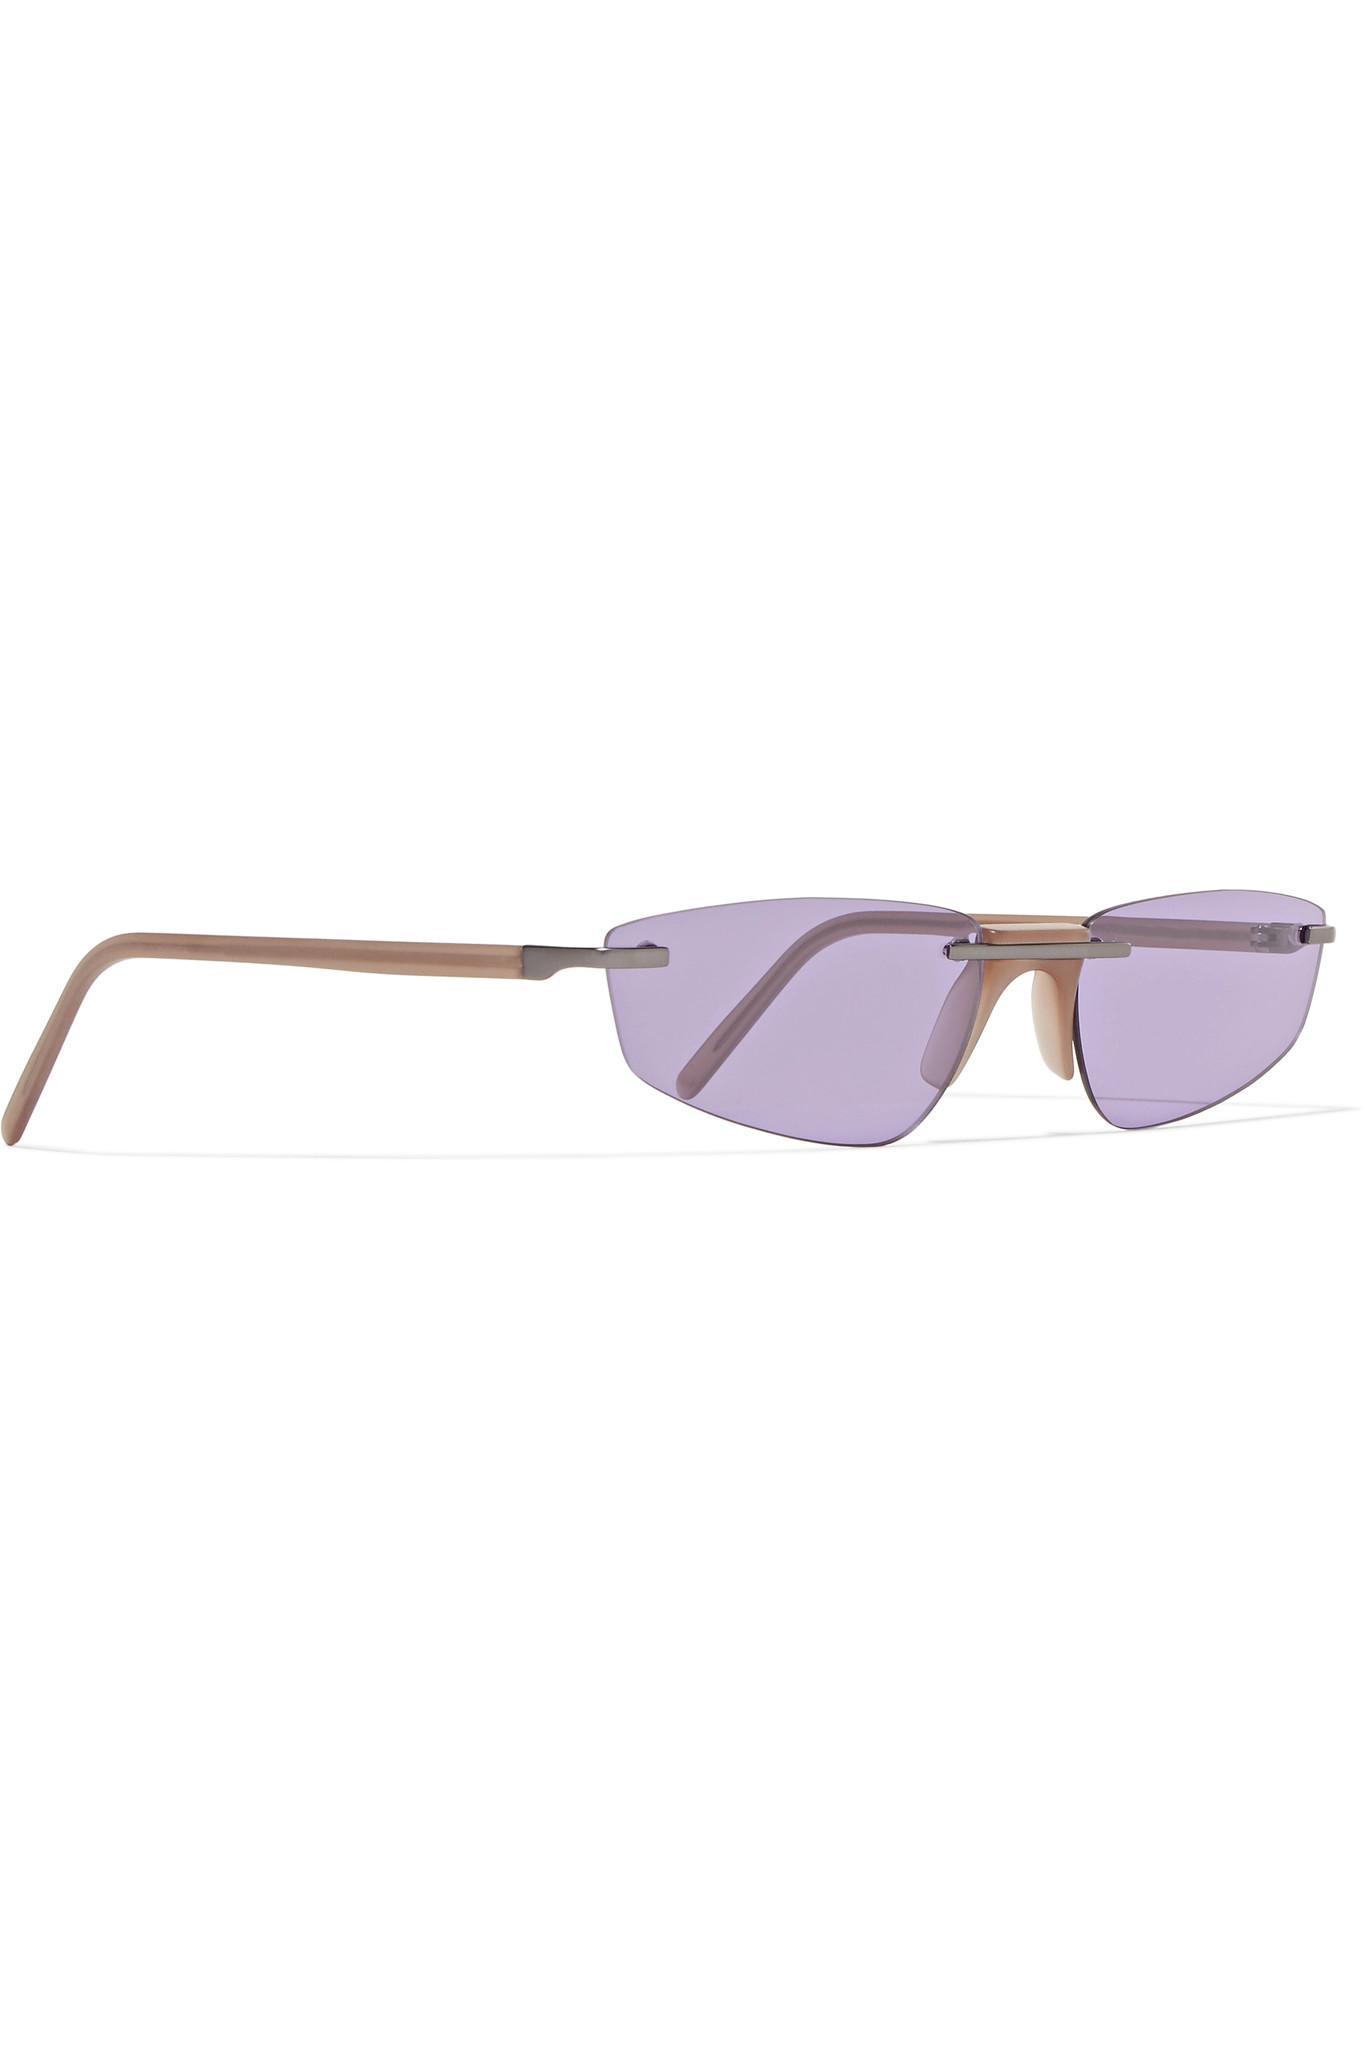 Andy Wolf Ophelia Cat-eye Acetate Sunglasses in Purple